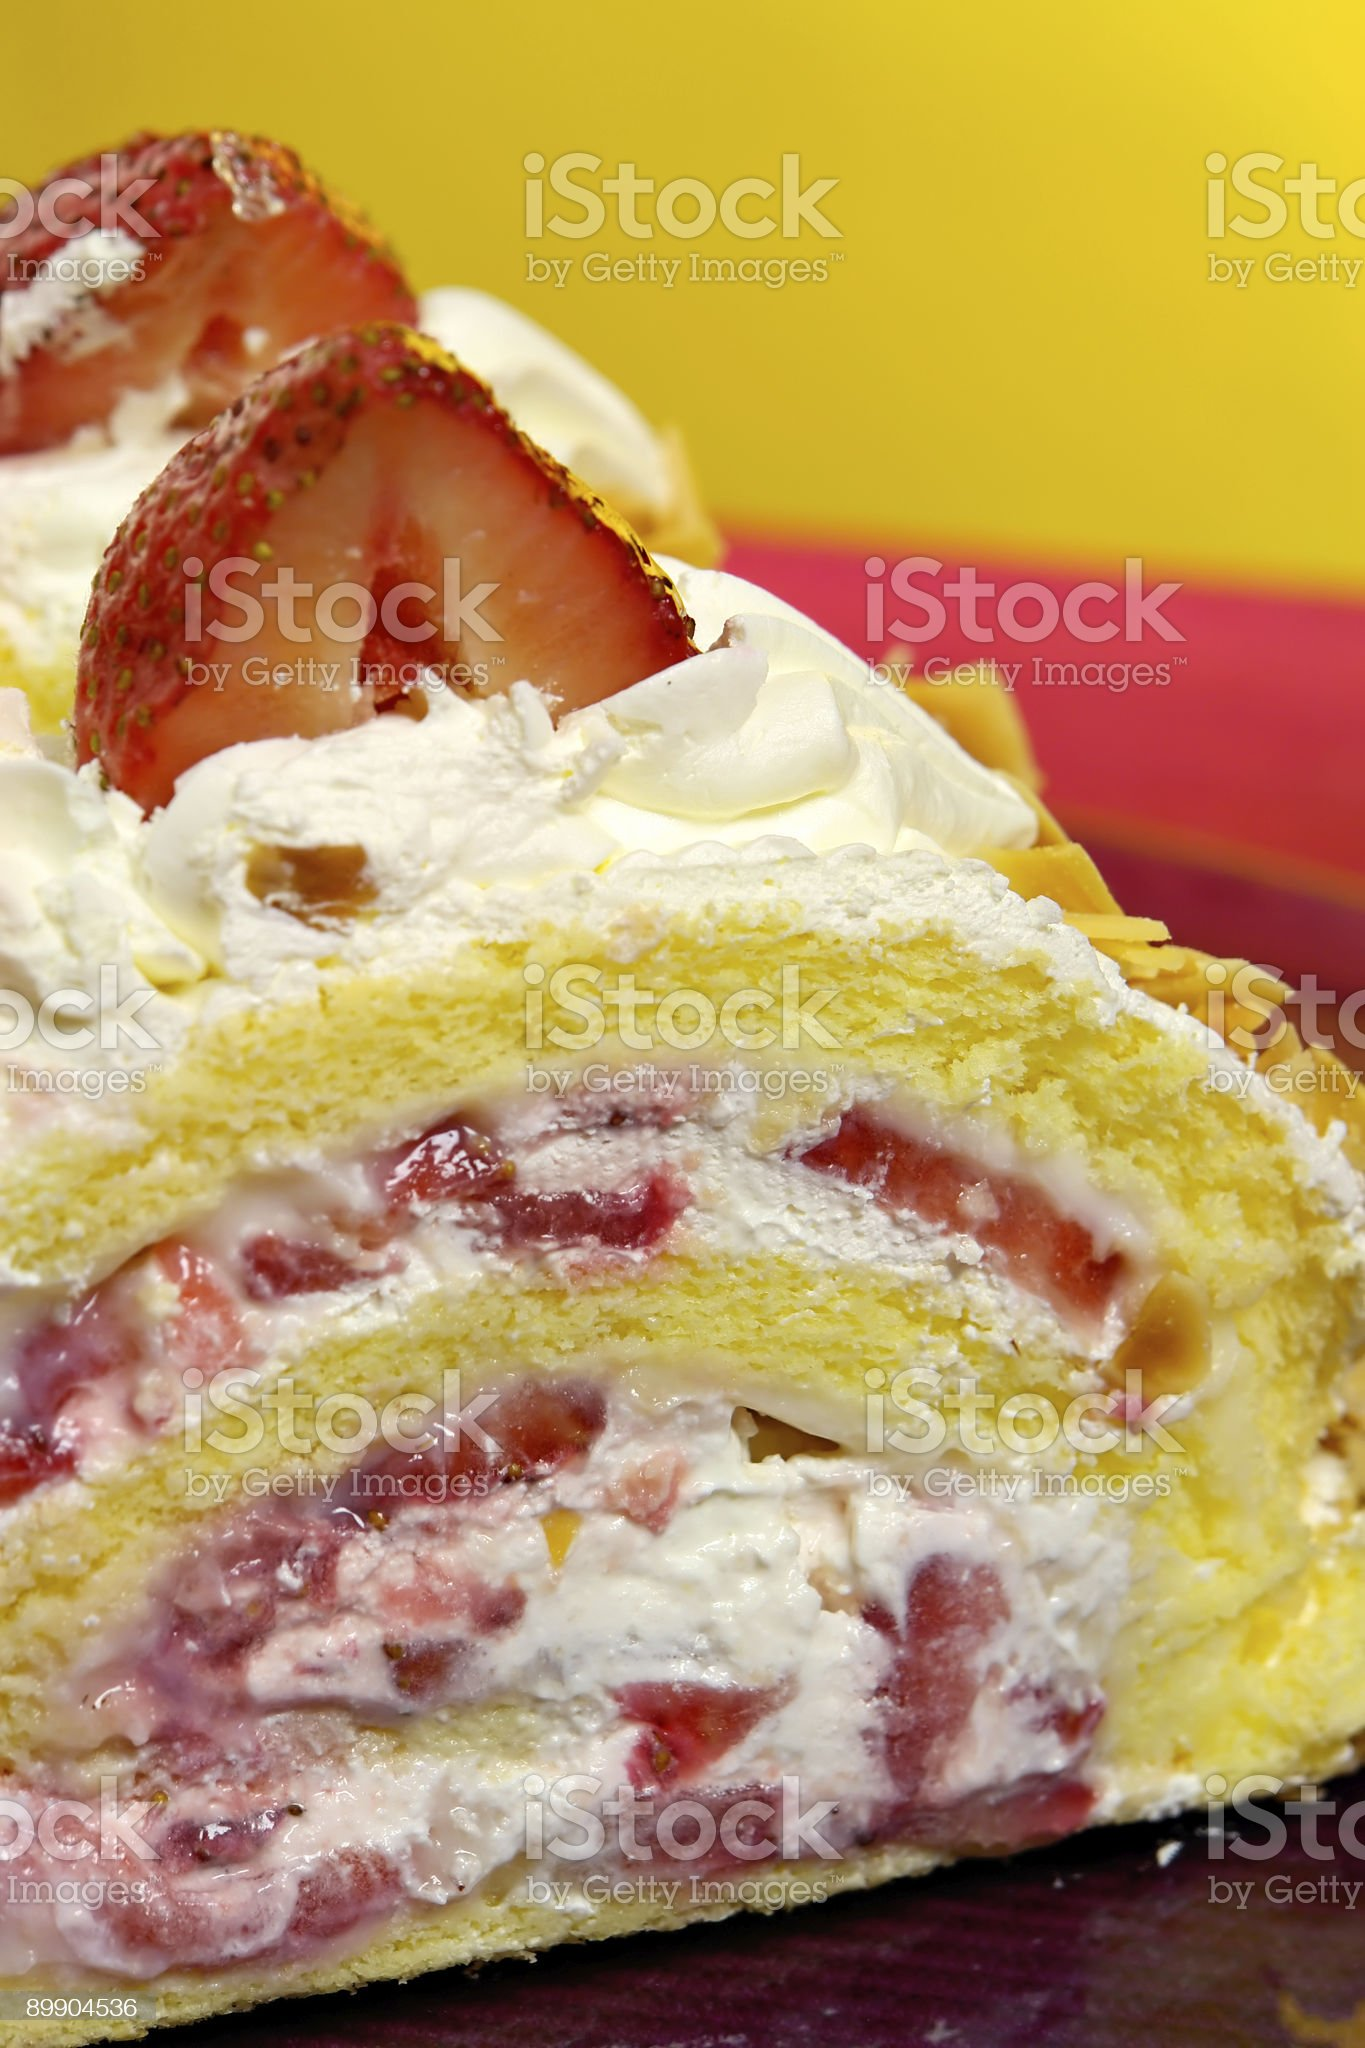 Cake with strawberrys royalty-free stock photo